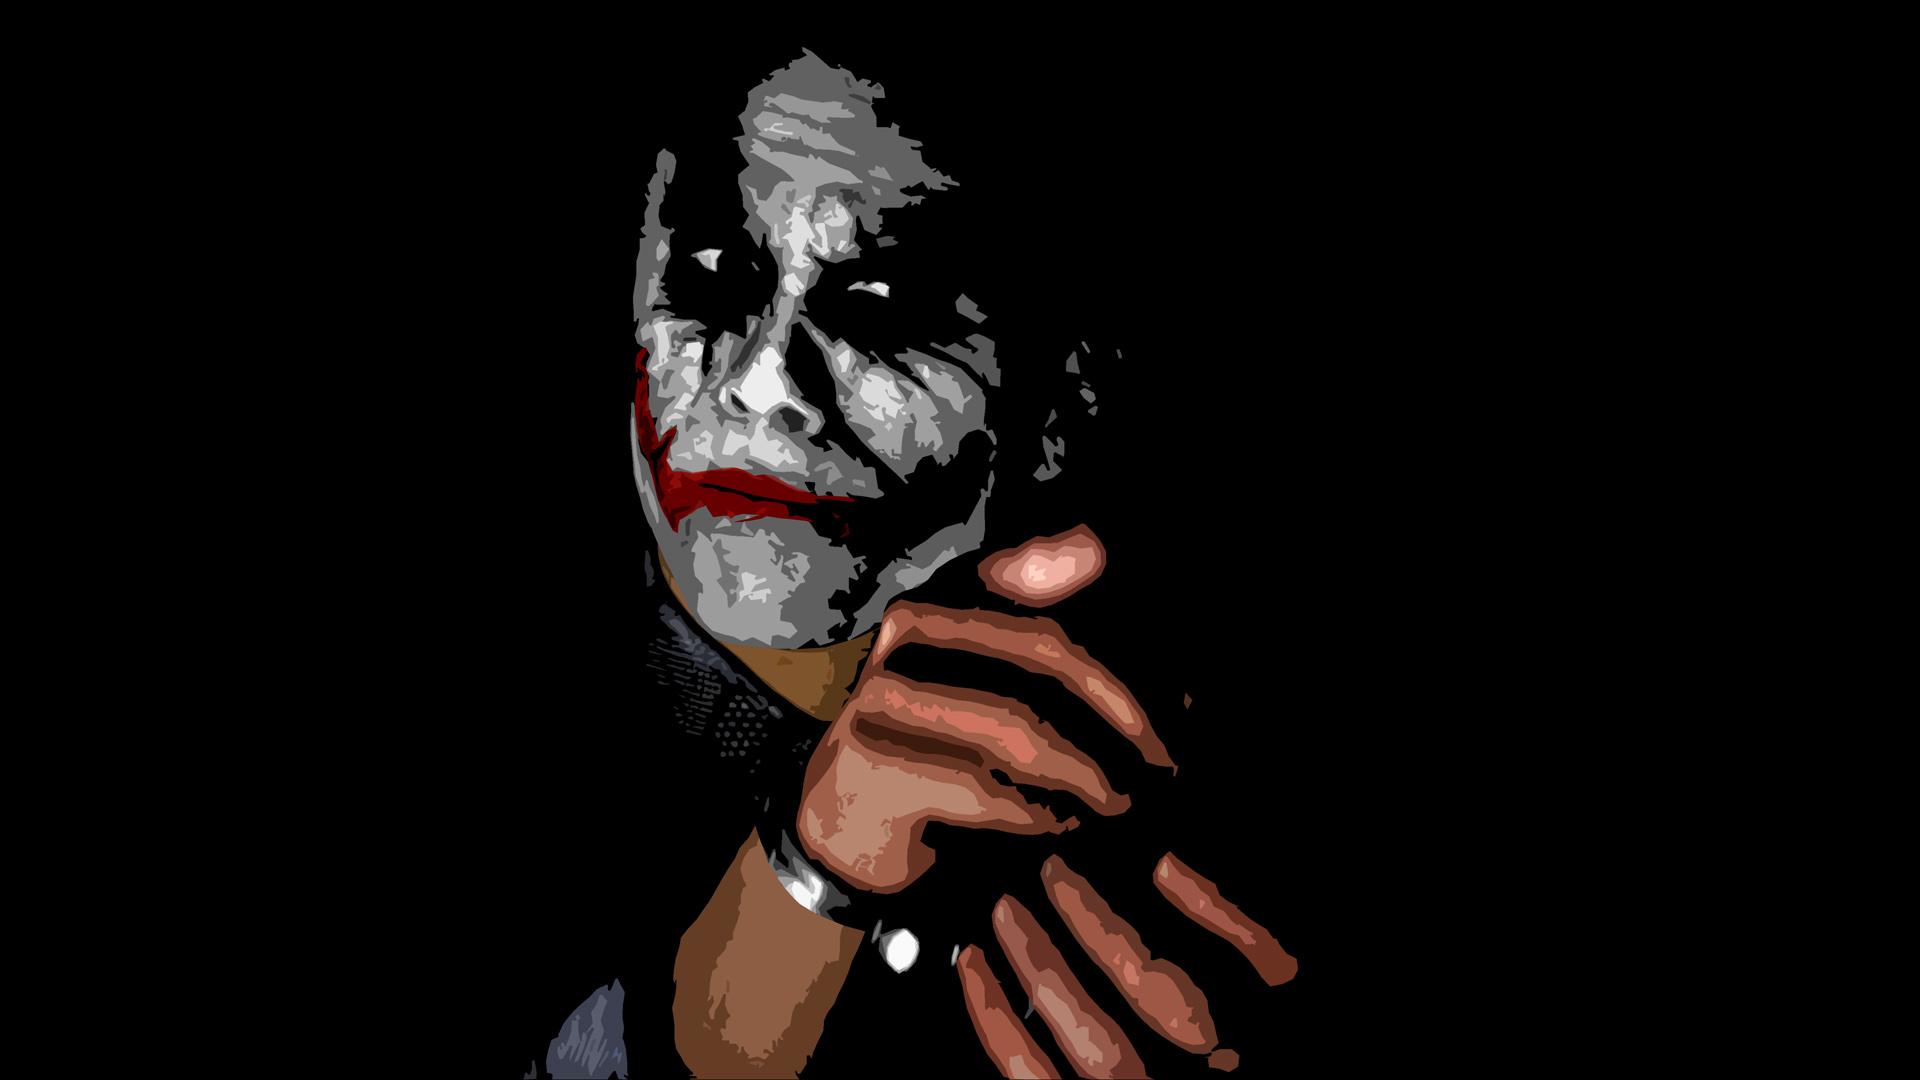 Hd wallpaper joker - Tags Joker The Joker Date 13 05 27 Resolution 1920x1080 Avg Dl Time 1